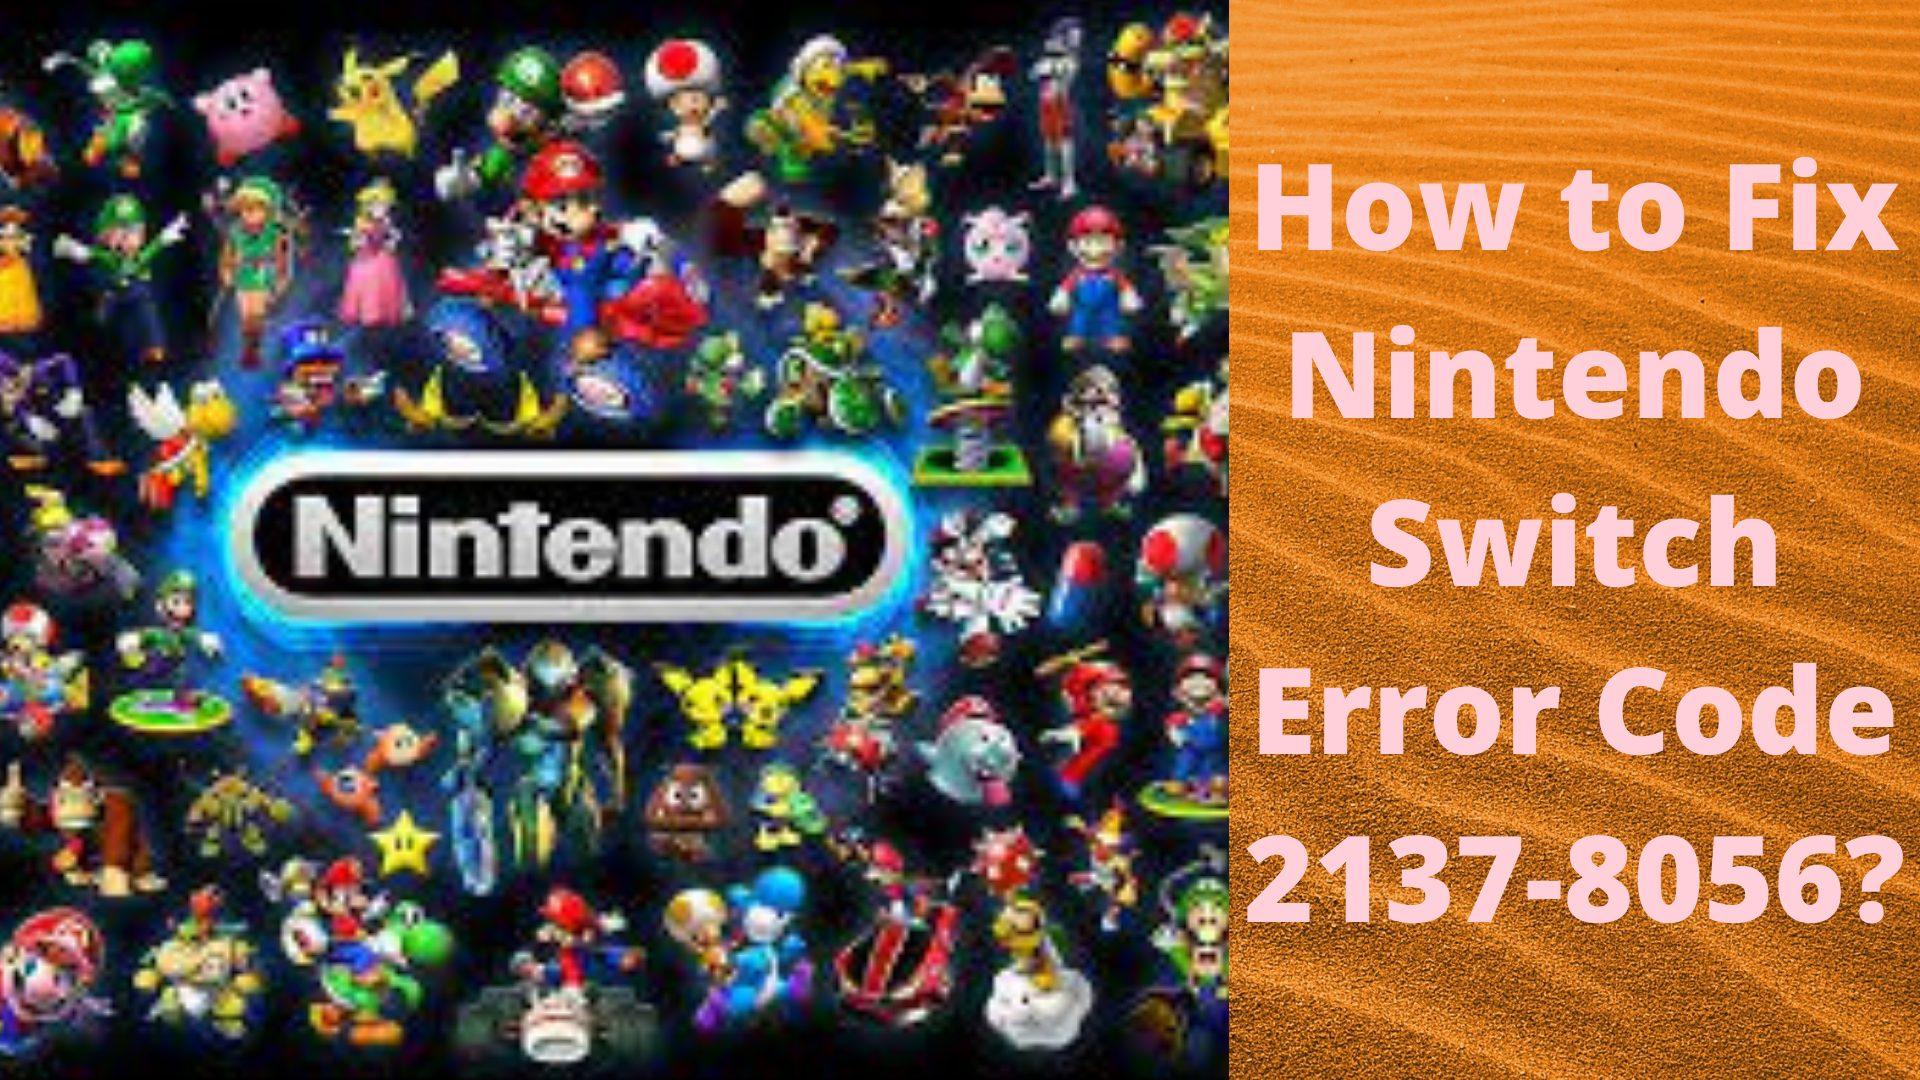 How to Fix Nintendo Switch Error Code 2137-8056